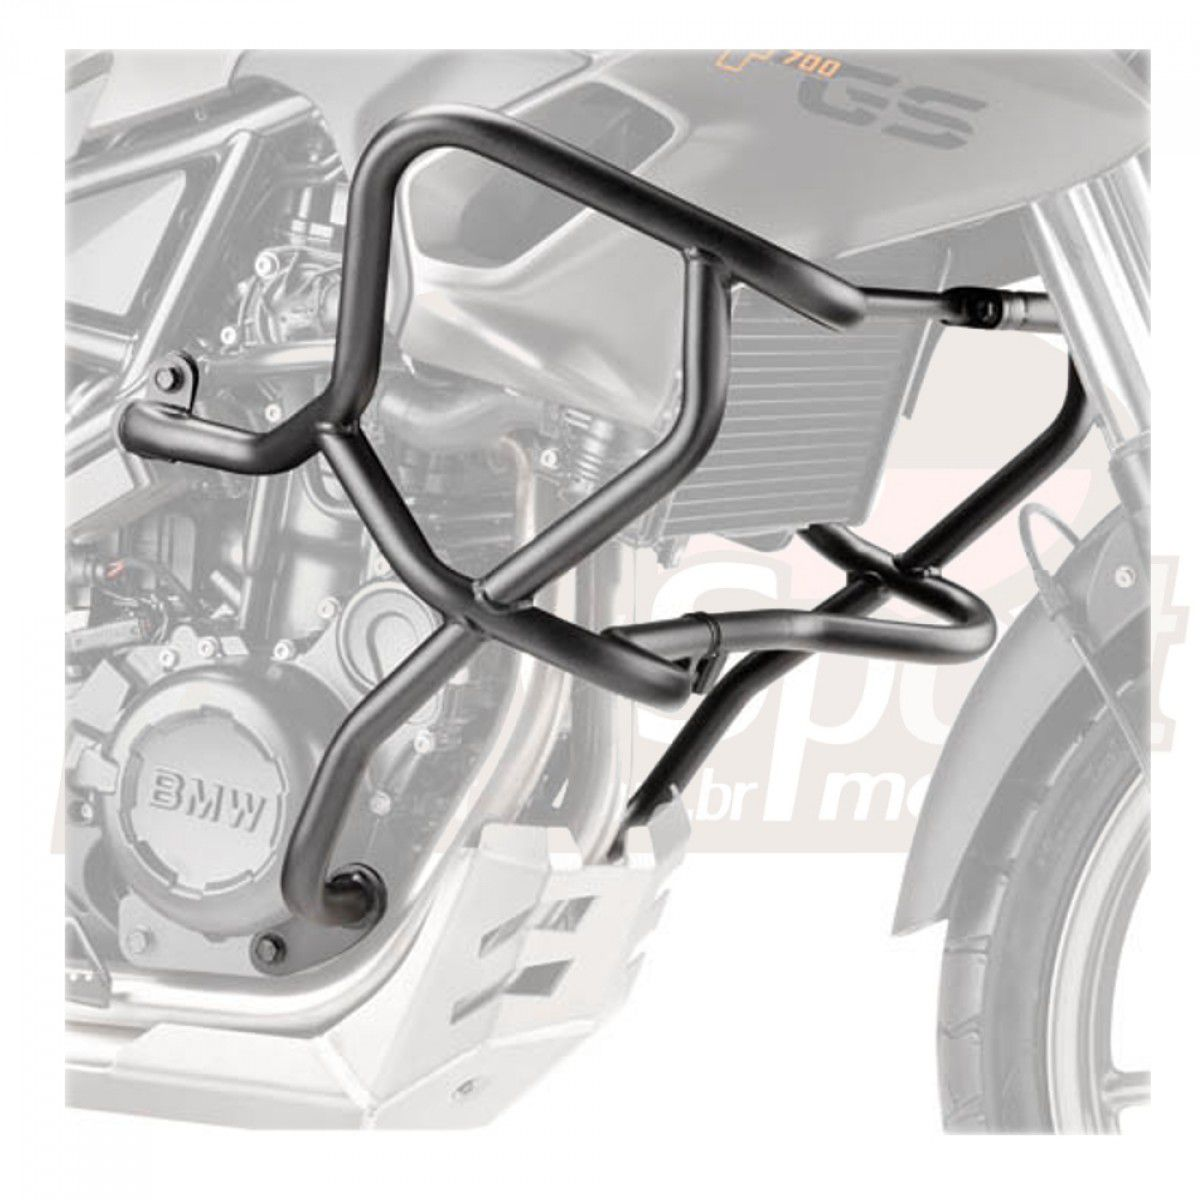 Protetor de Motor Givi TN5103 F800GS 2014 / F700GS 13-17 - Pronta Entrega  - Nova Suzuki Motos e Acessórios